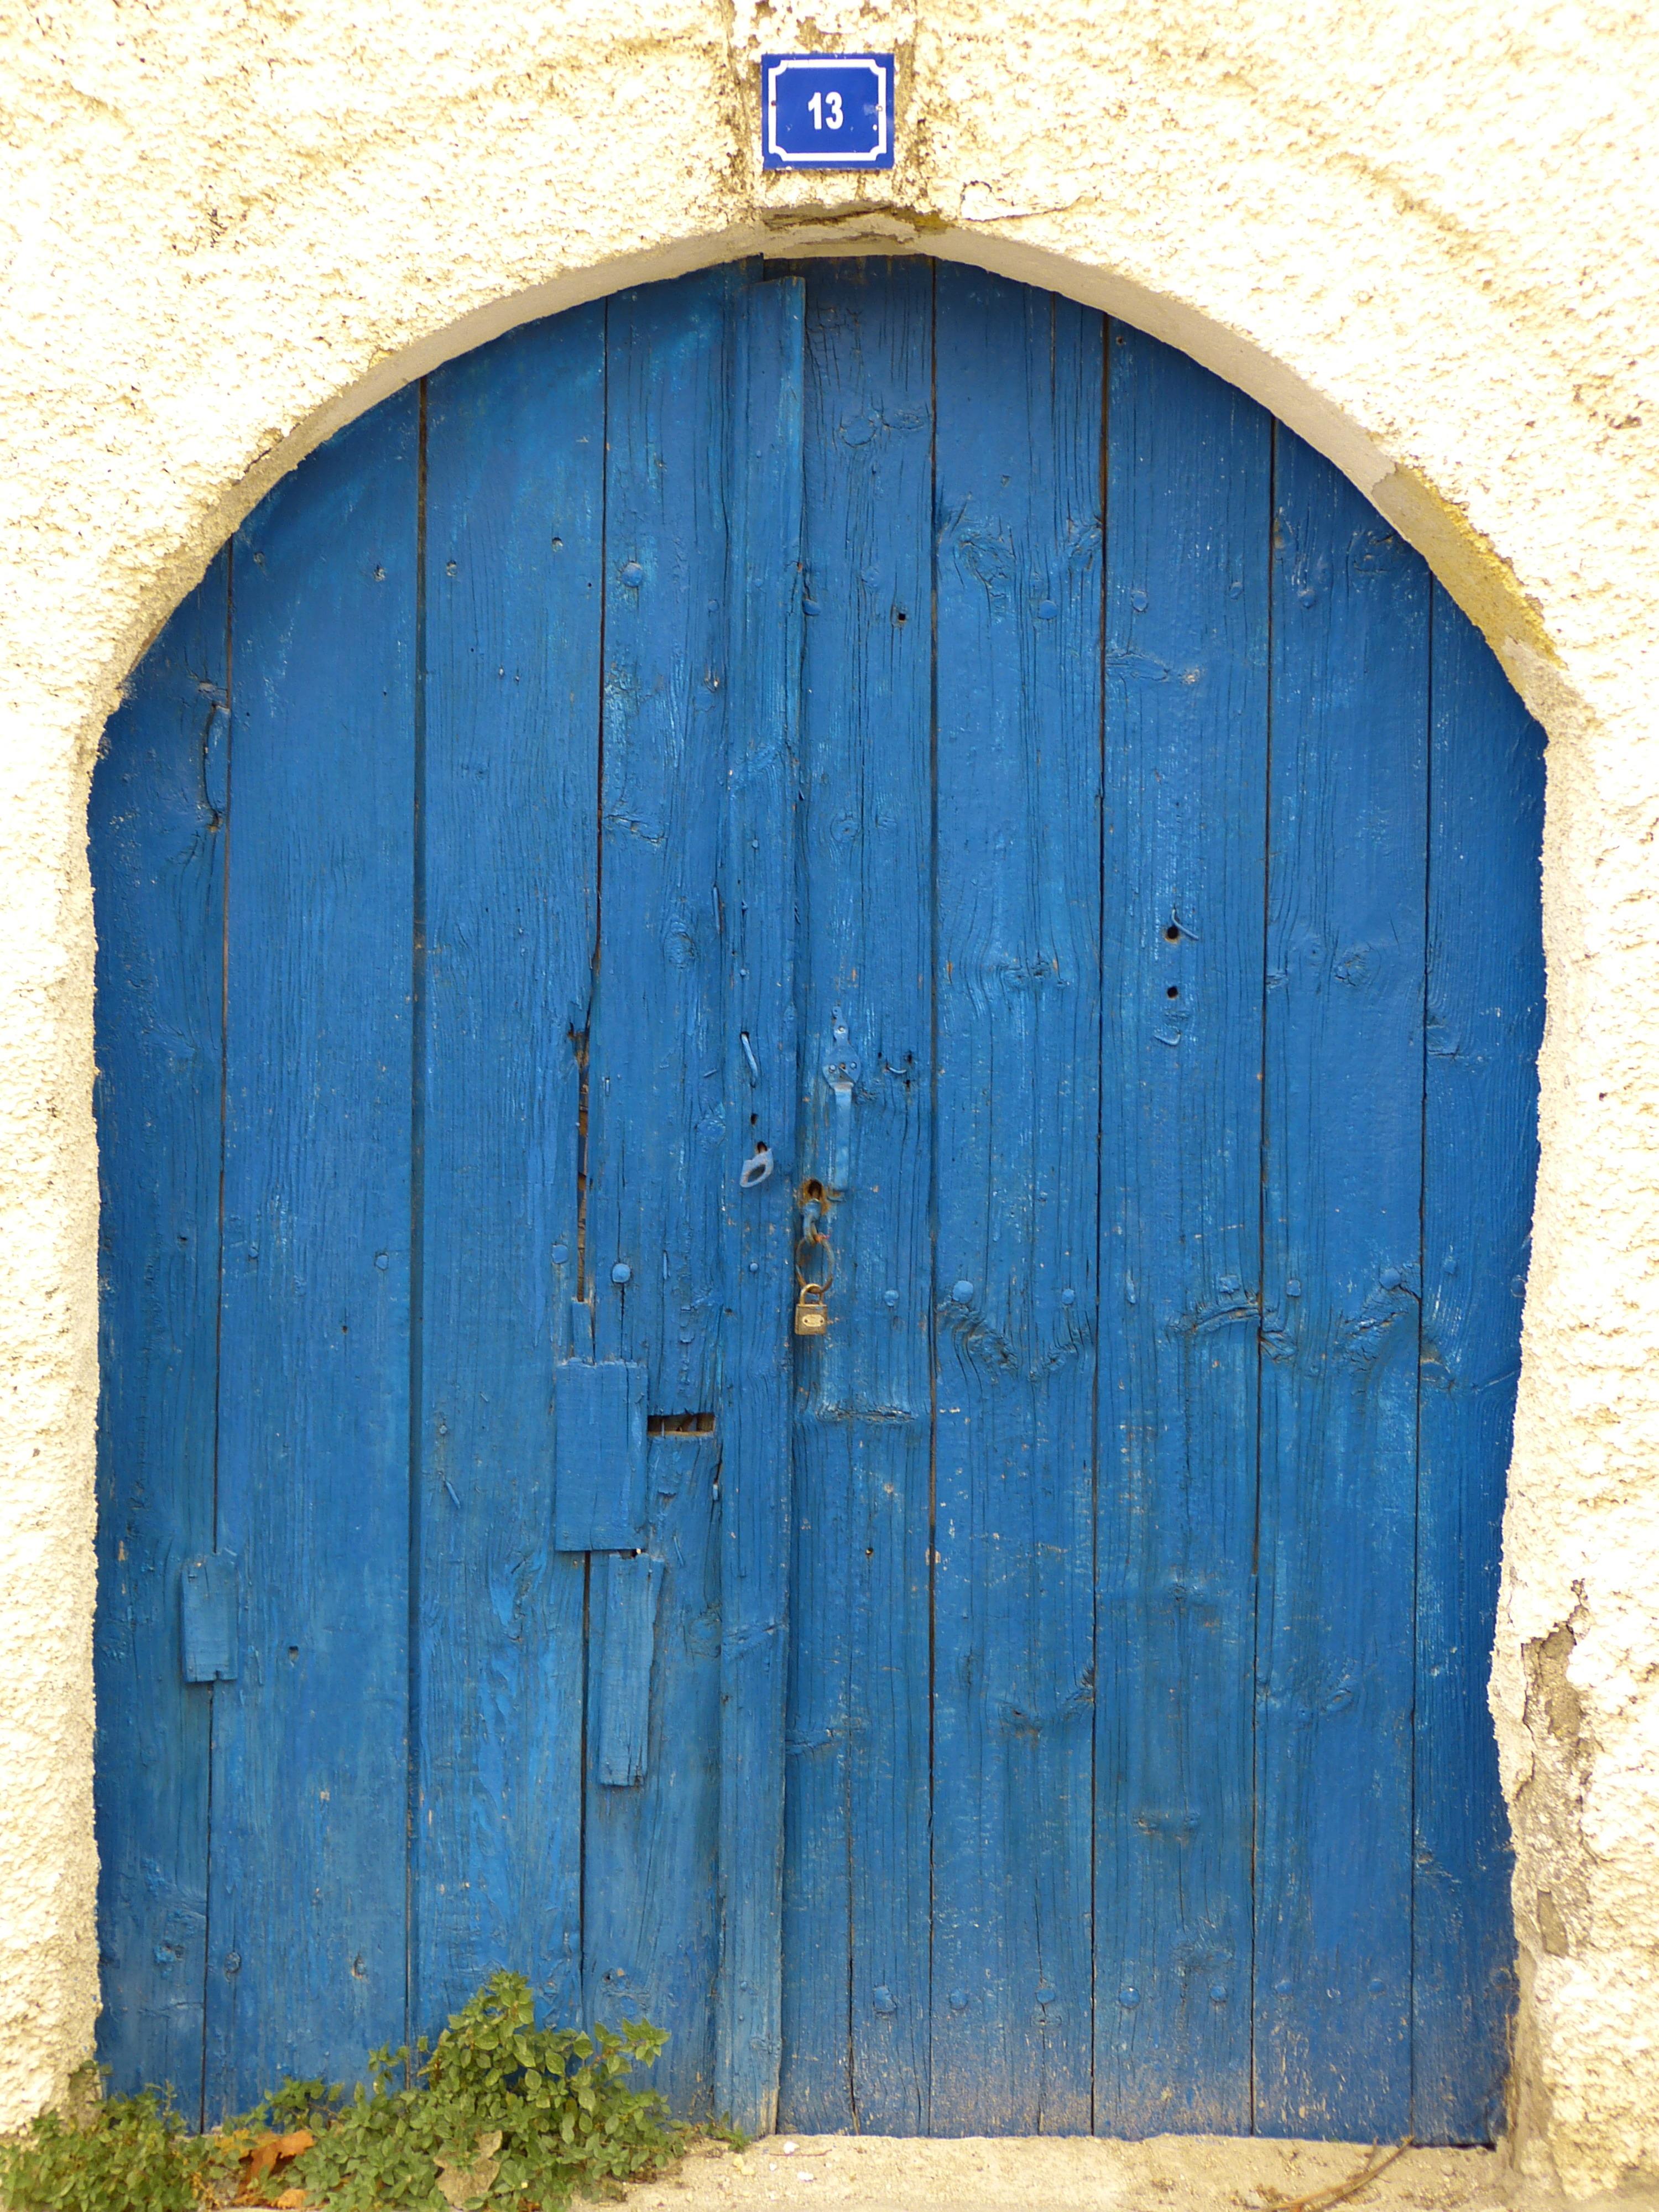 Fotos gratis madera ventana antiguo pared cobertizo for Puertas en forma de arco